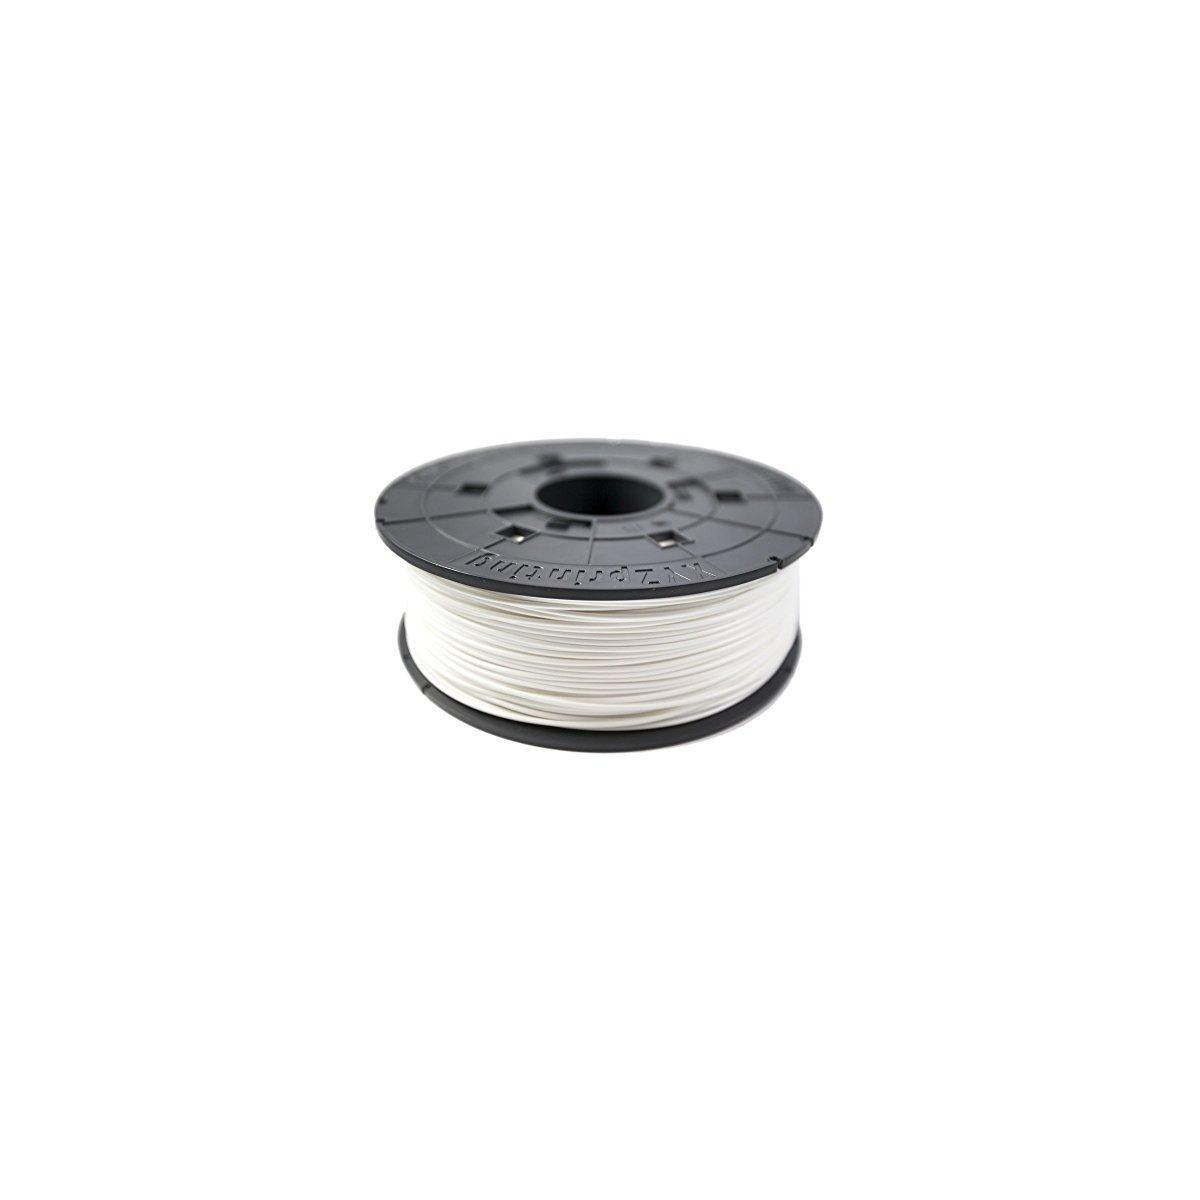 Cartouche xyz printing bobine recharge abs blanc neige - 2% de...